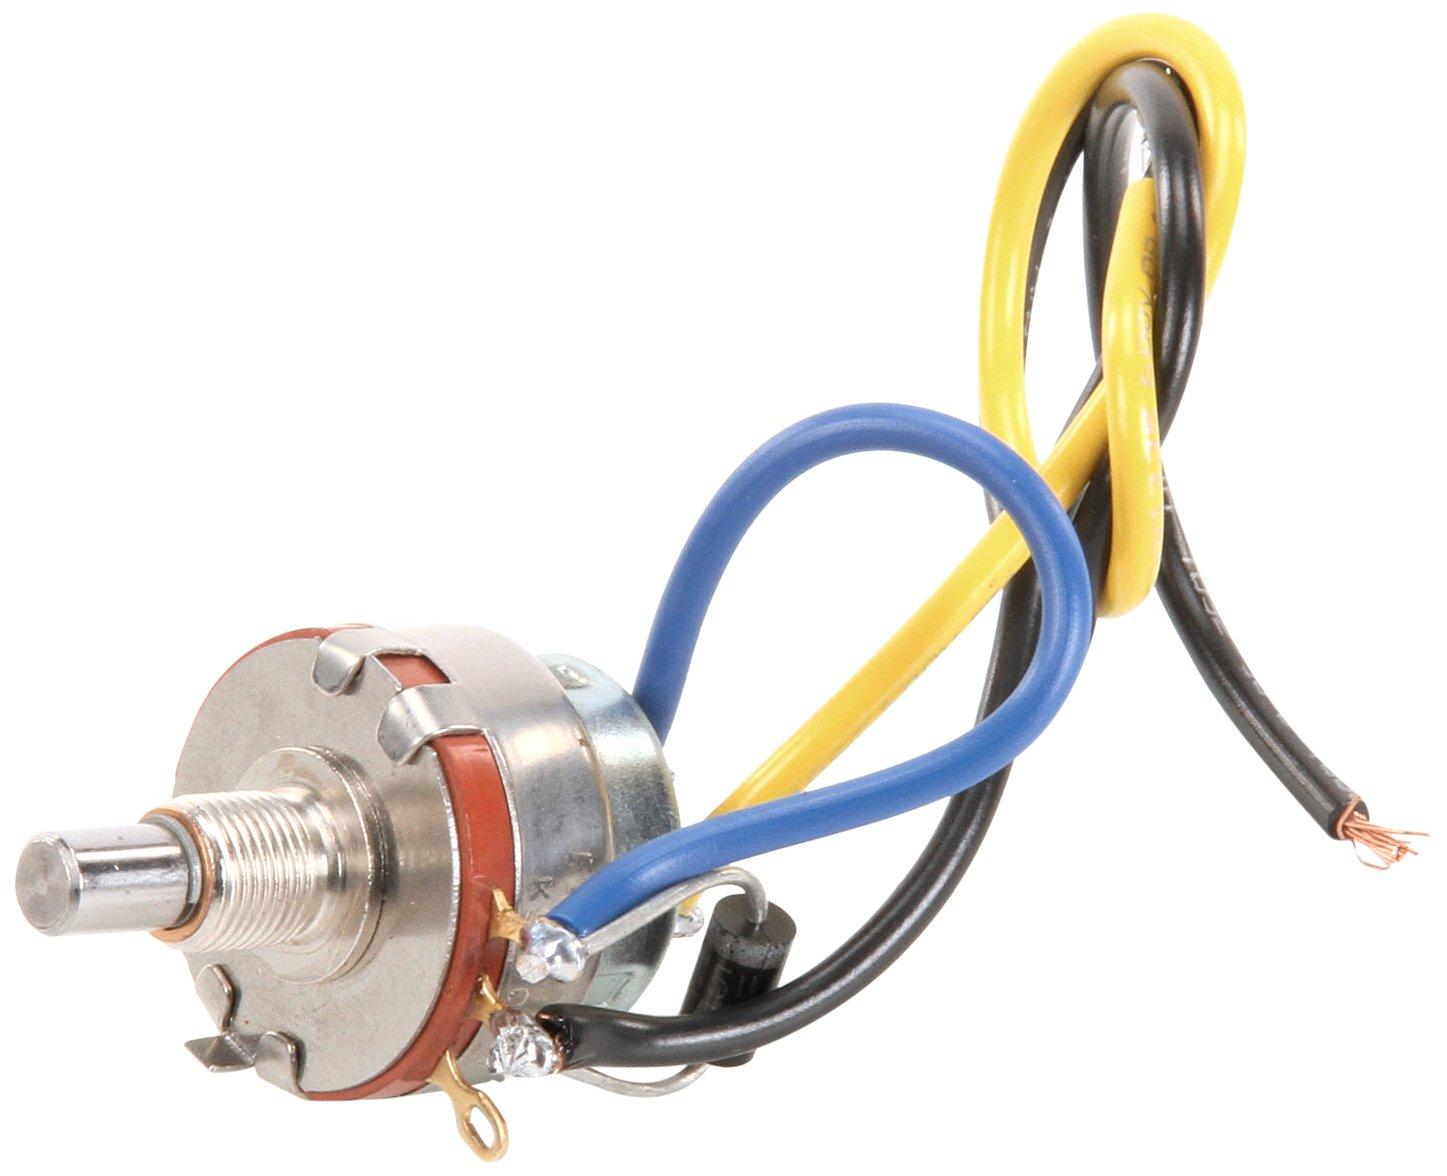 Star SP-118000 120-volt Speed Control for Holman Conveyor Toaster 200 Ohm